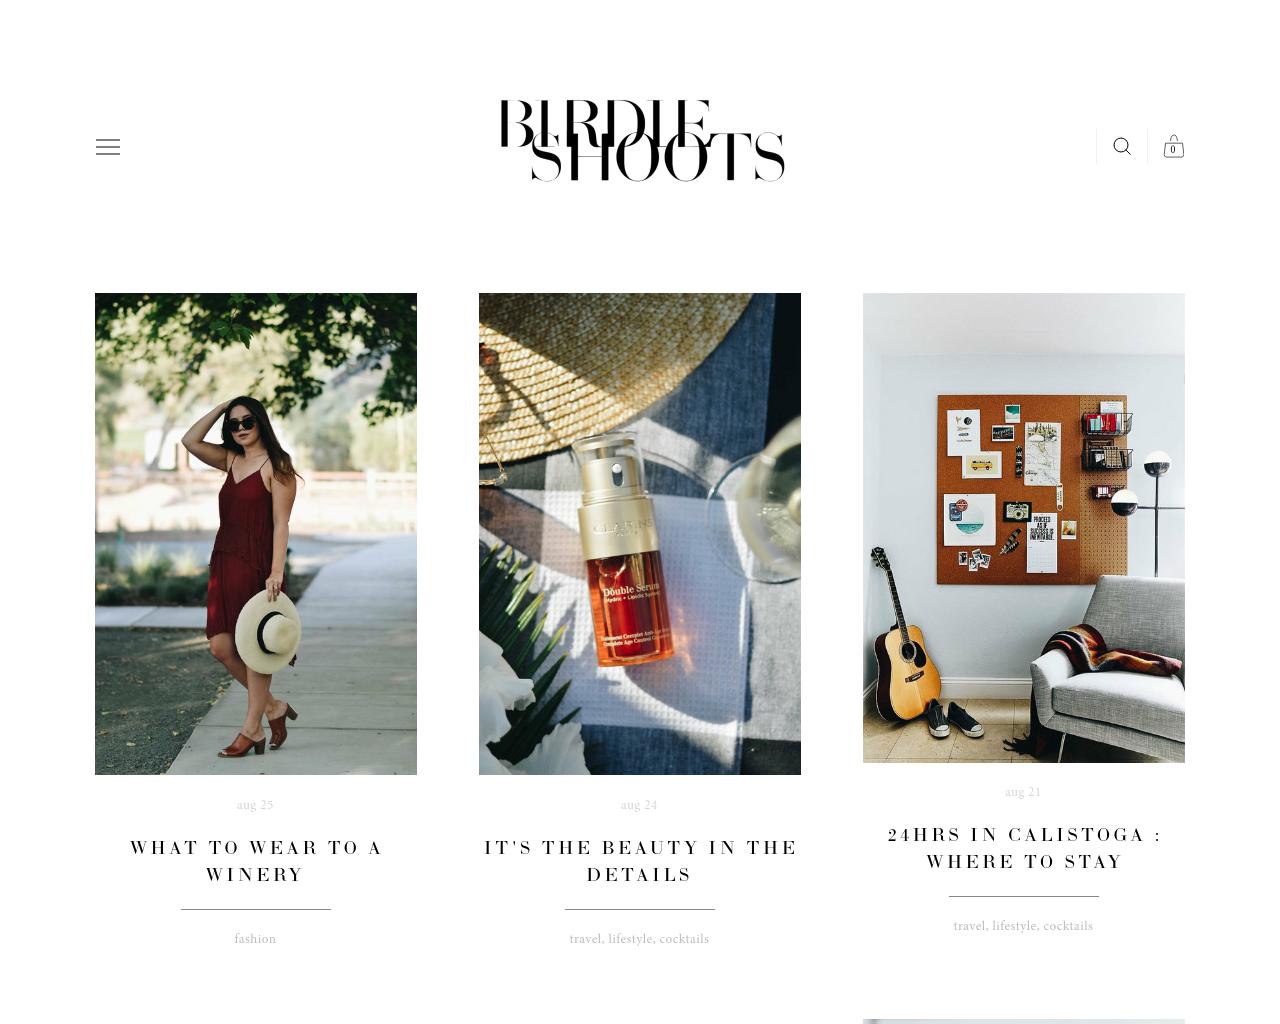 Birdie-Shoots-Advertising-Reviews-Pricing